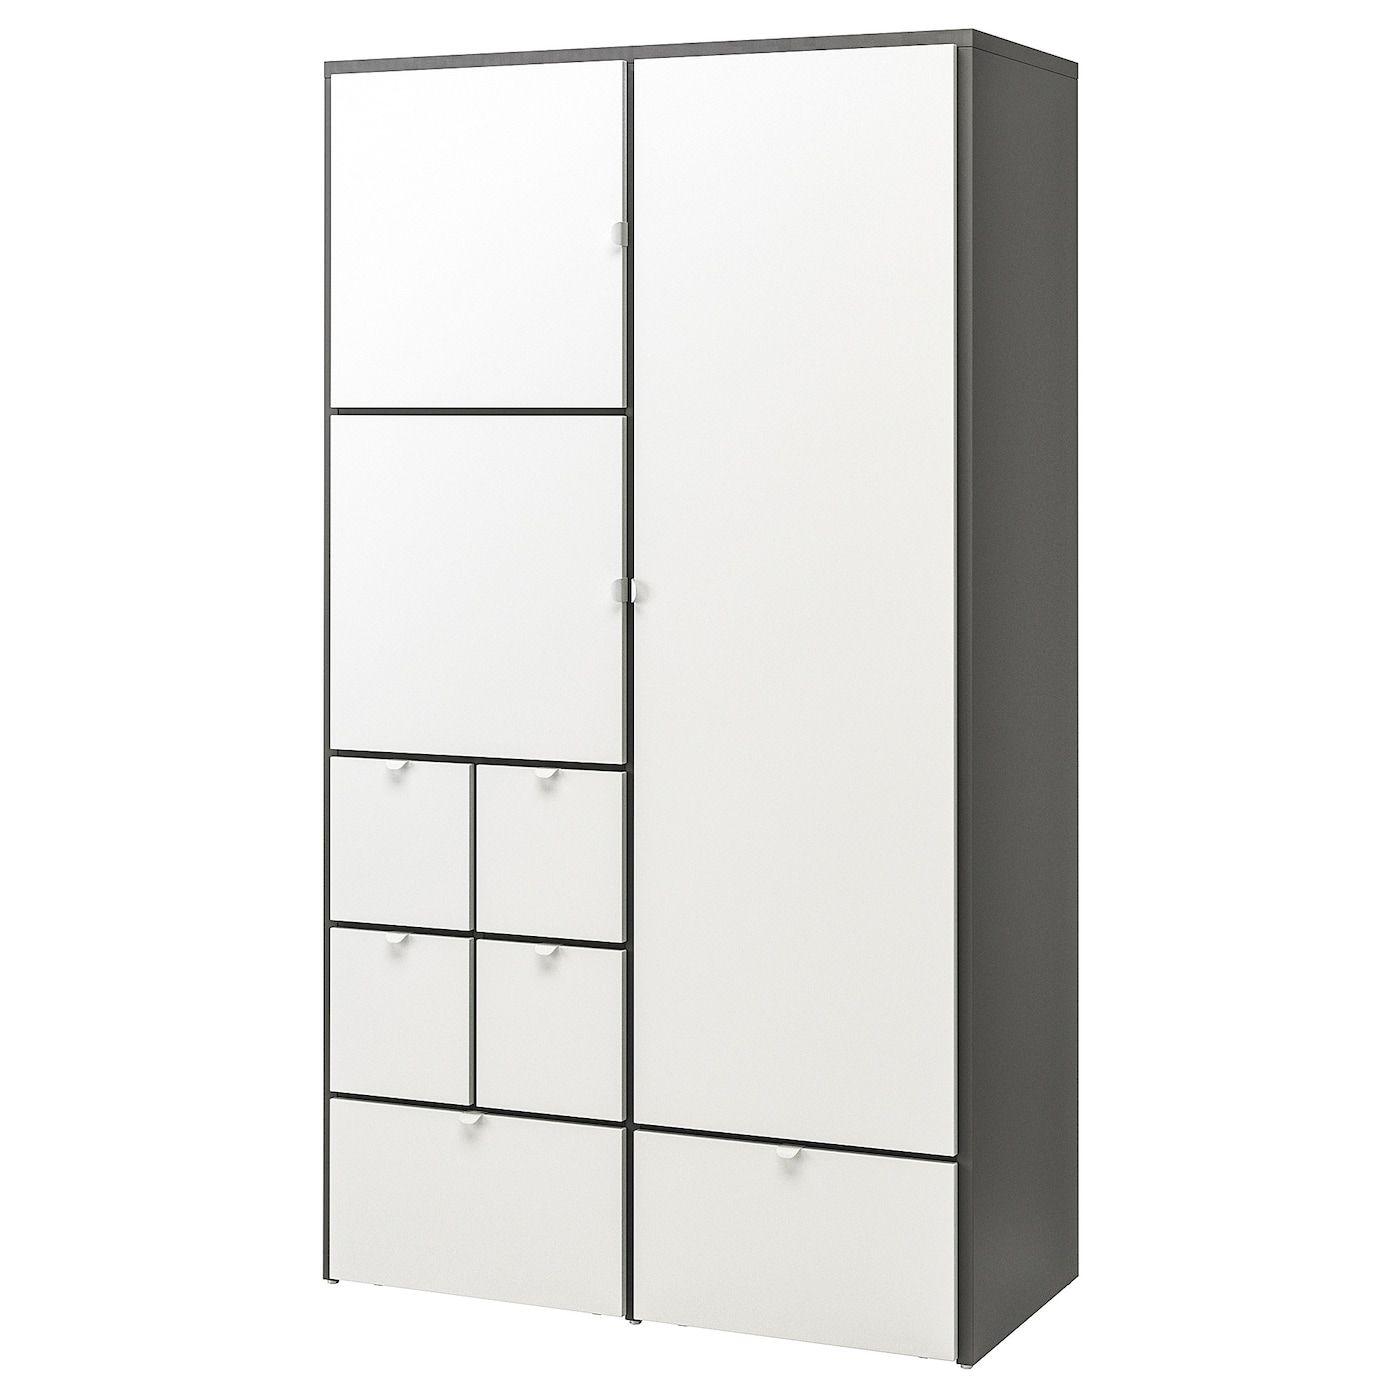 Visthus Kleiderschrank Grau Weiss Ikea Ikea Wardrobe